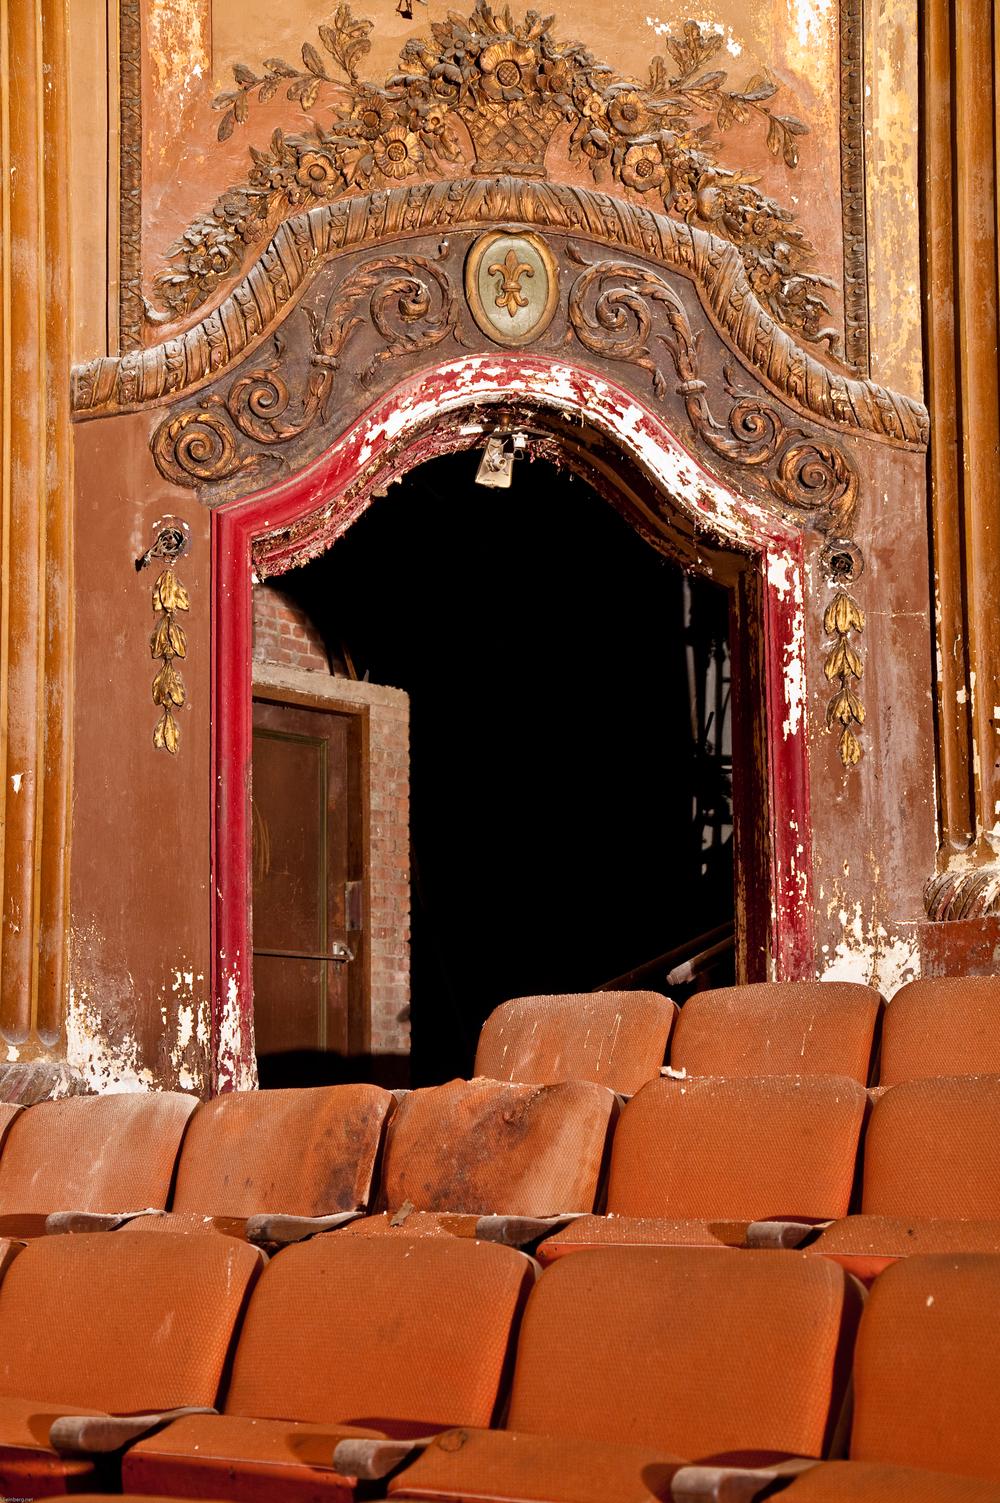 kings-theatre_4597003331_o.jpg